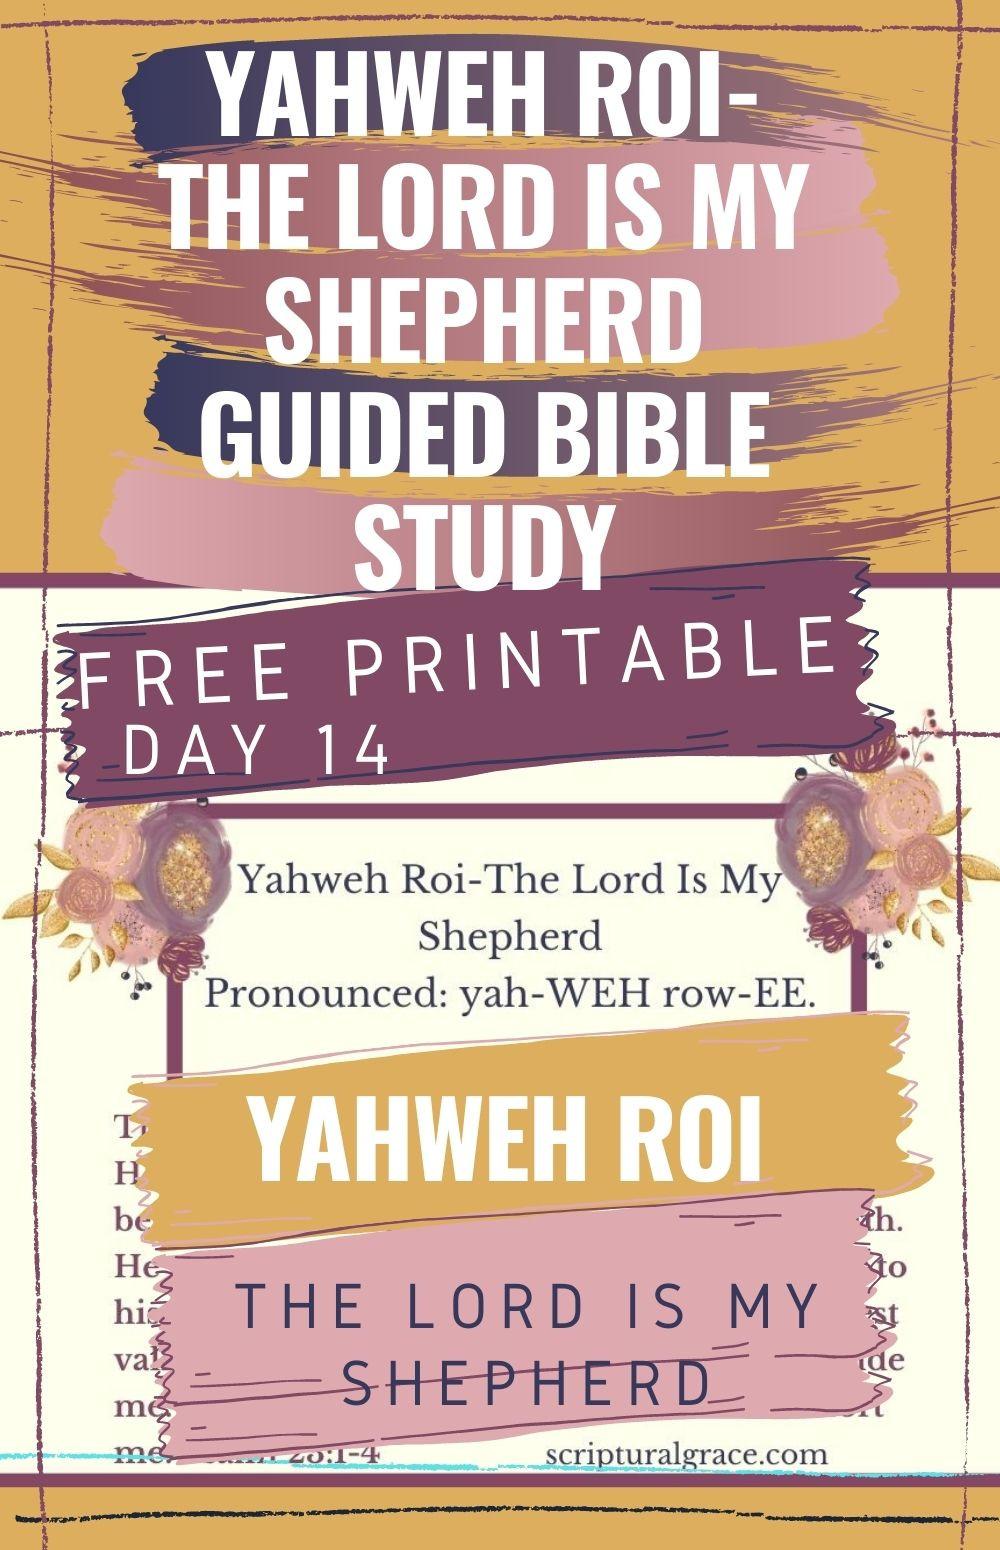 Yahweh Roi-The Lord Is My Shepherd bible study free printable